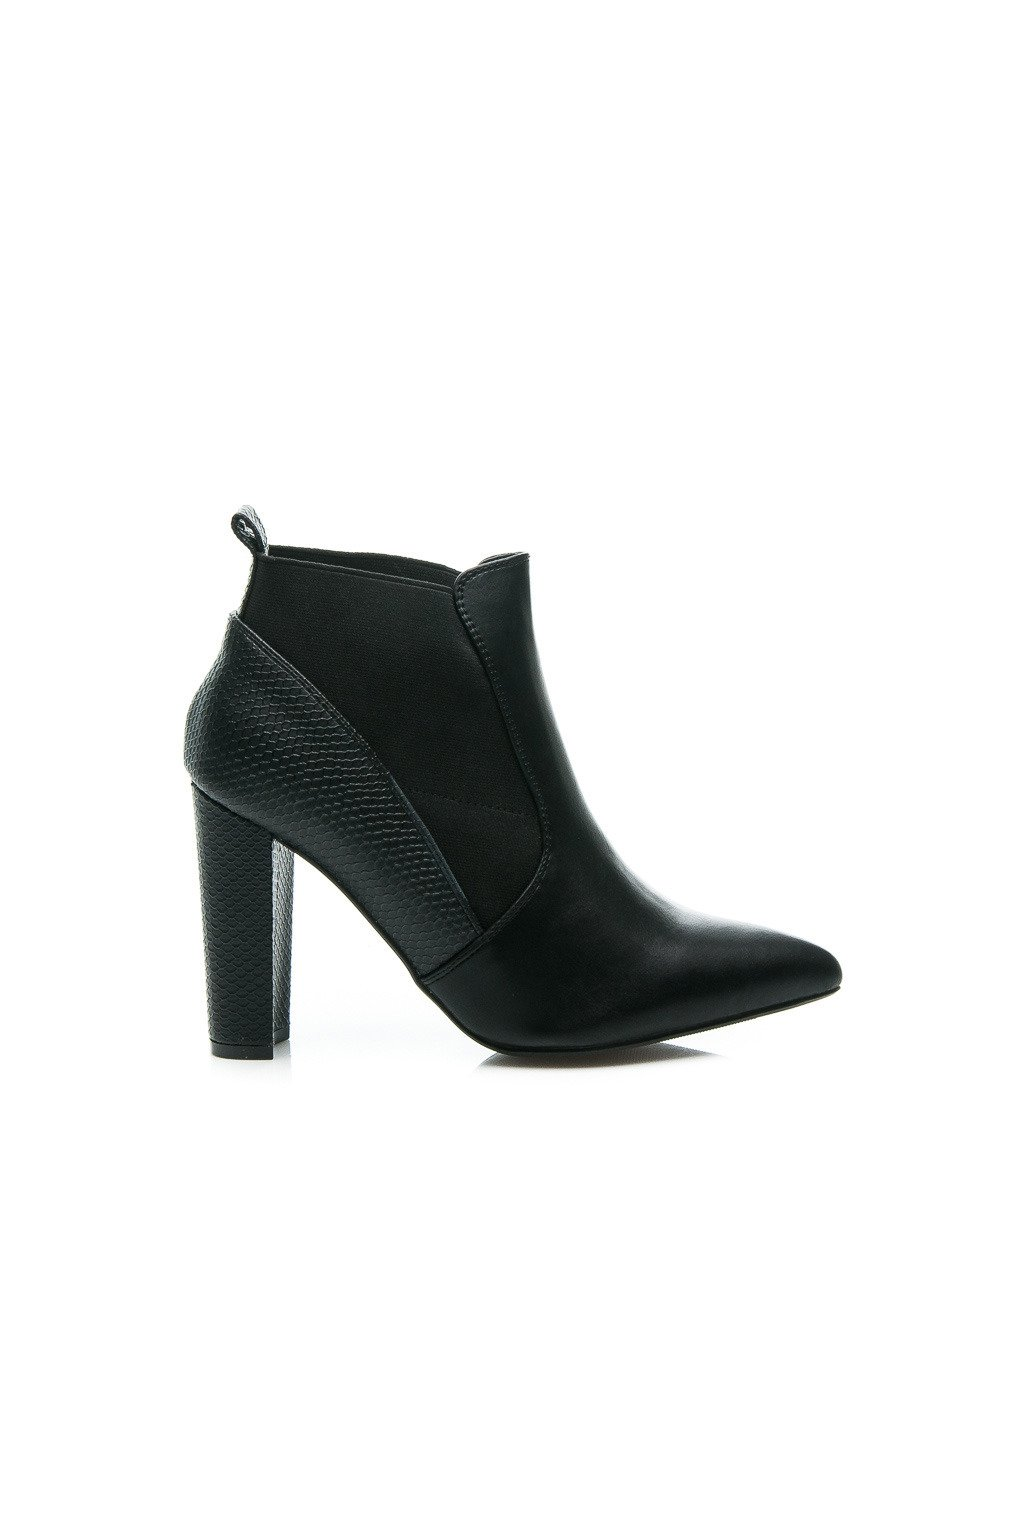 c3d1617eed5b Čierne topánky na vysokom opätku 2146-6B   S1-1P